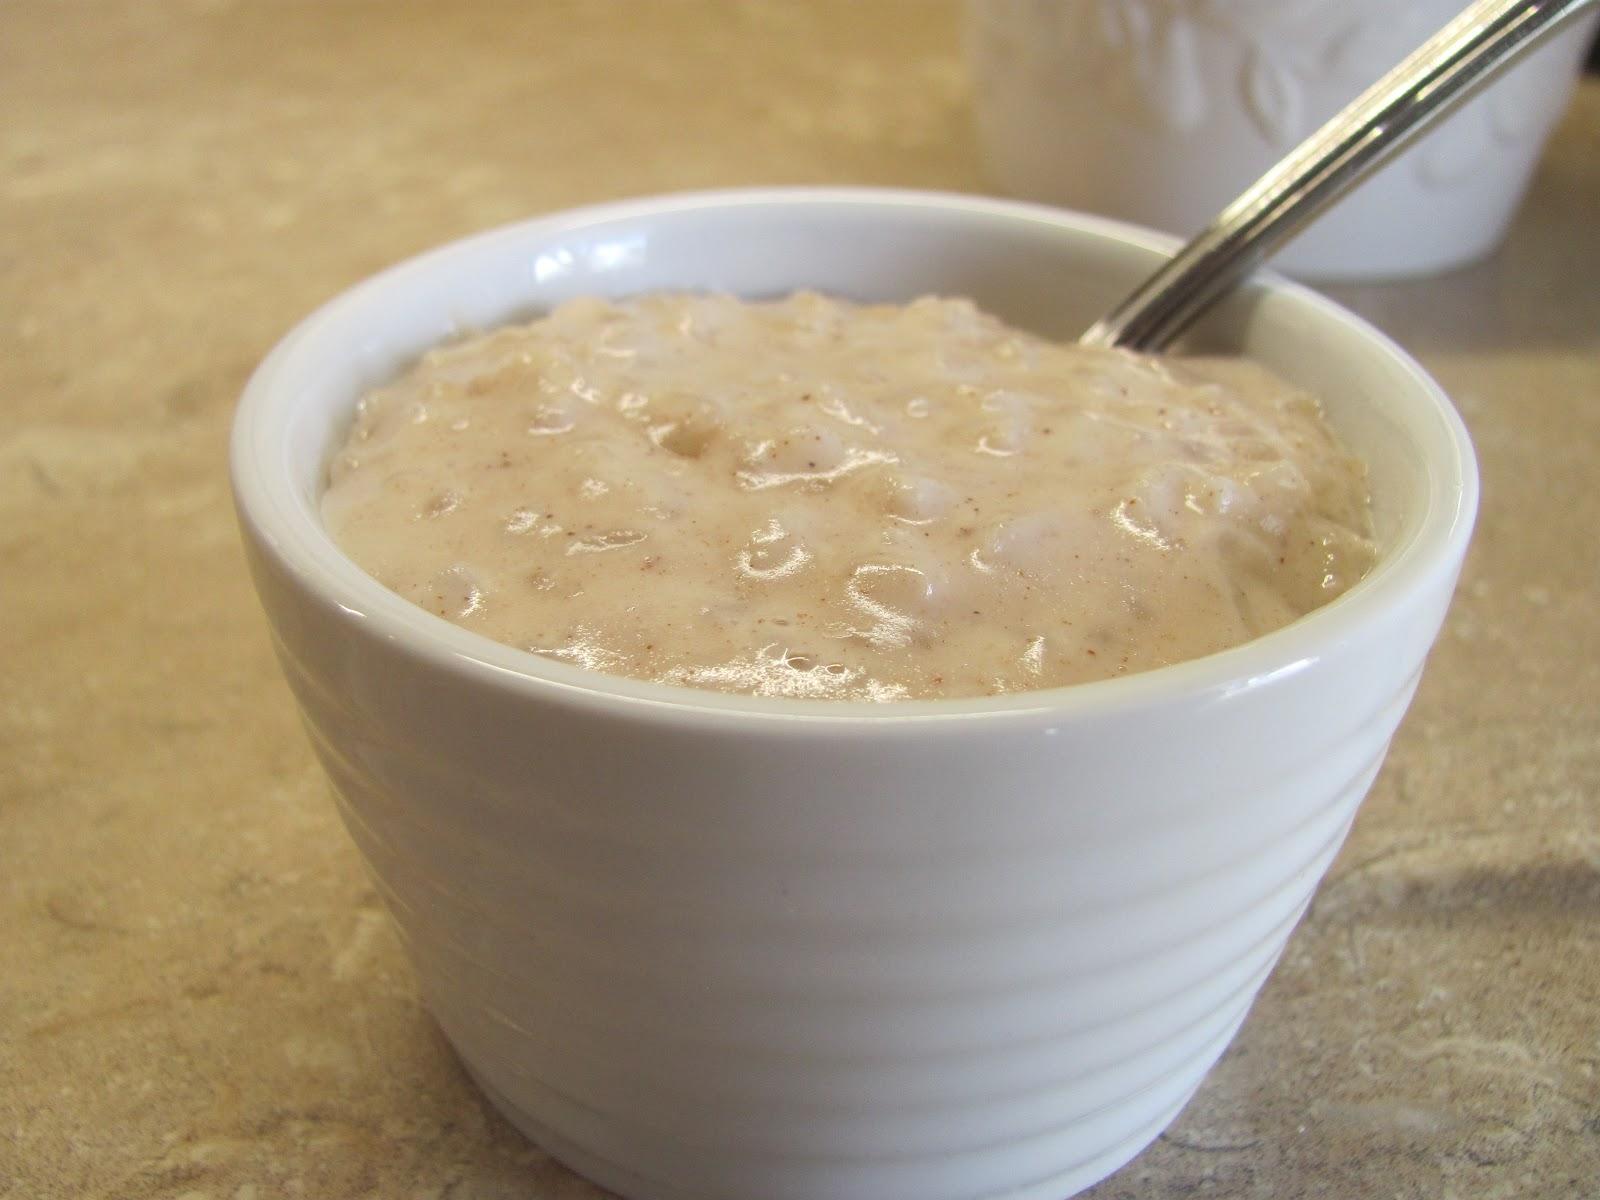 ... rice pudding creamy rice pudding rice pudding sutlijash rice pudding